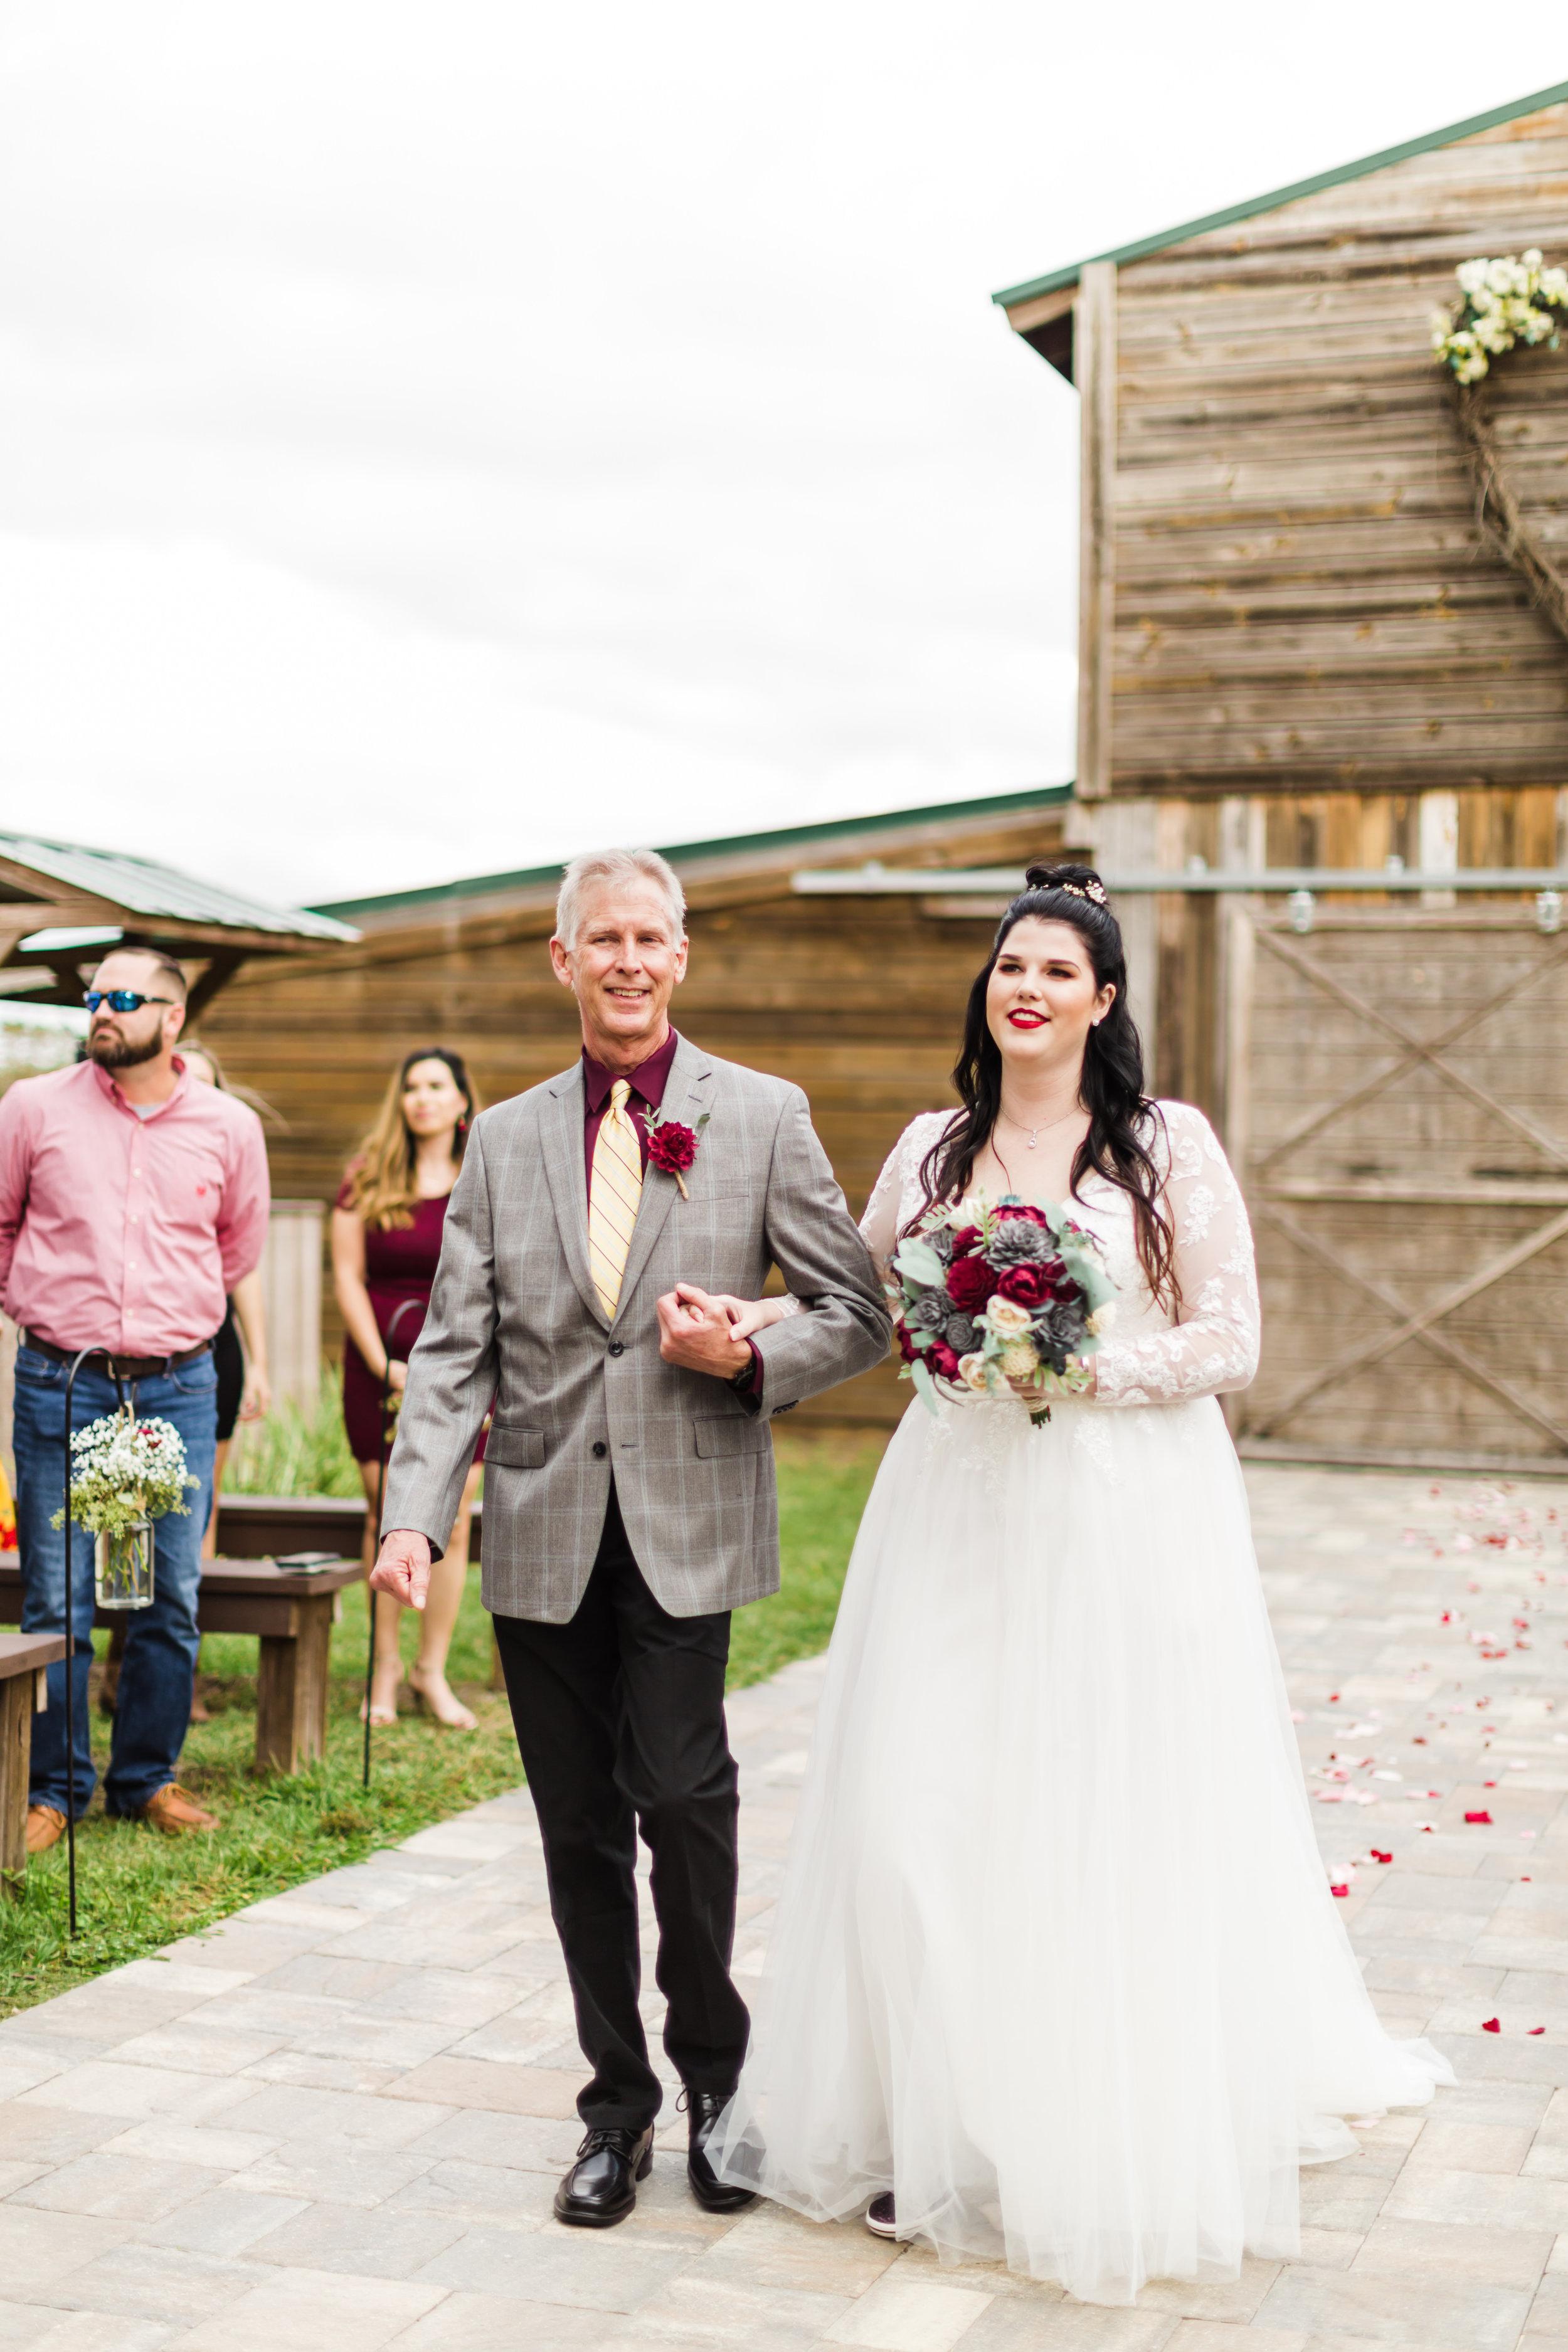 2018.11.11 Paige and TJ Enchanting Barn Wedding (195 of 841).jpg